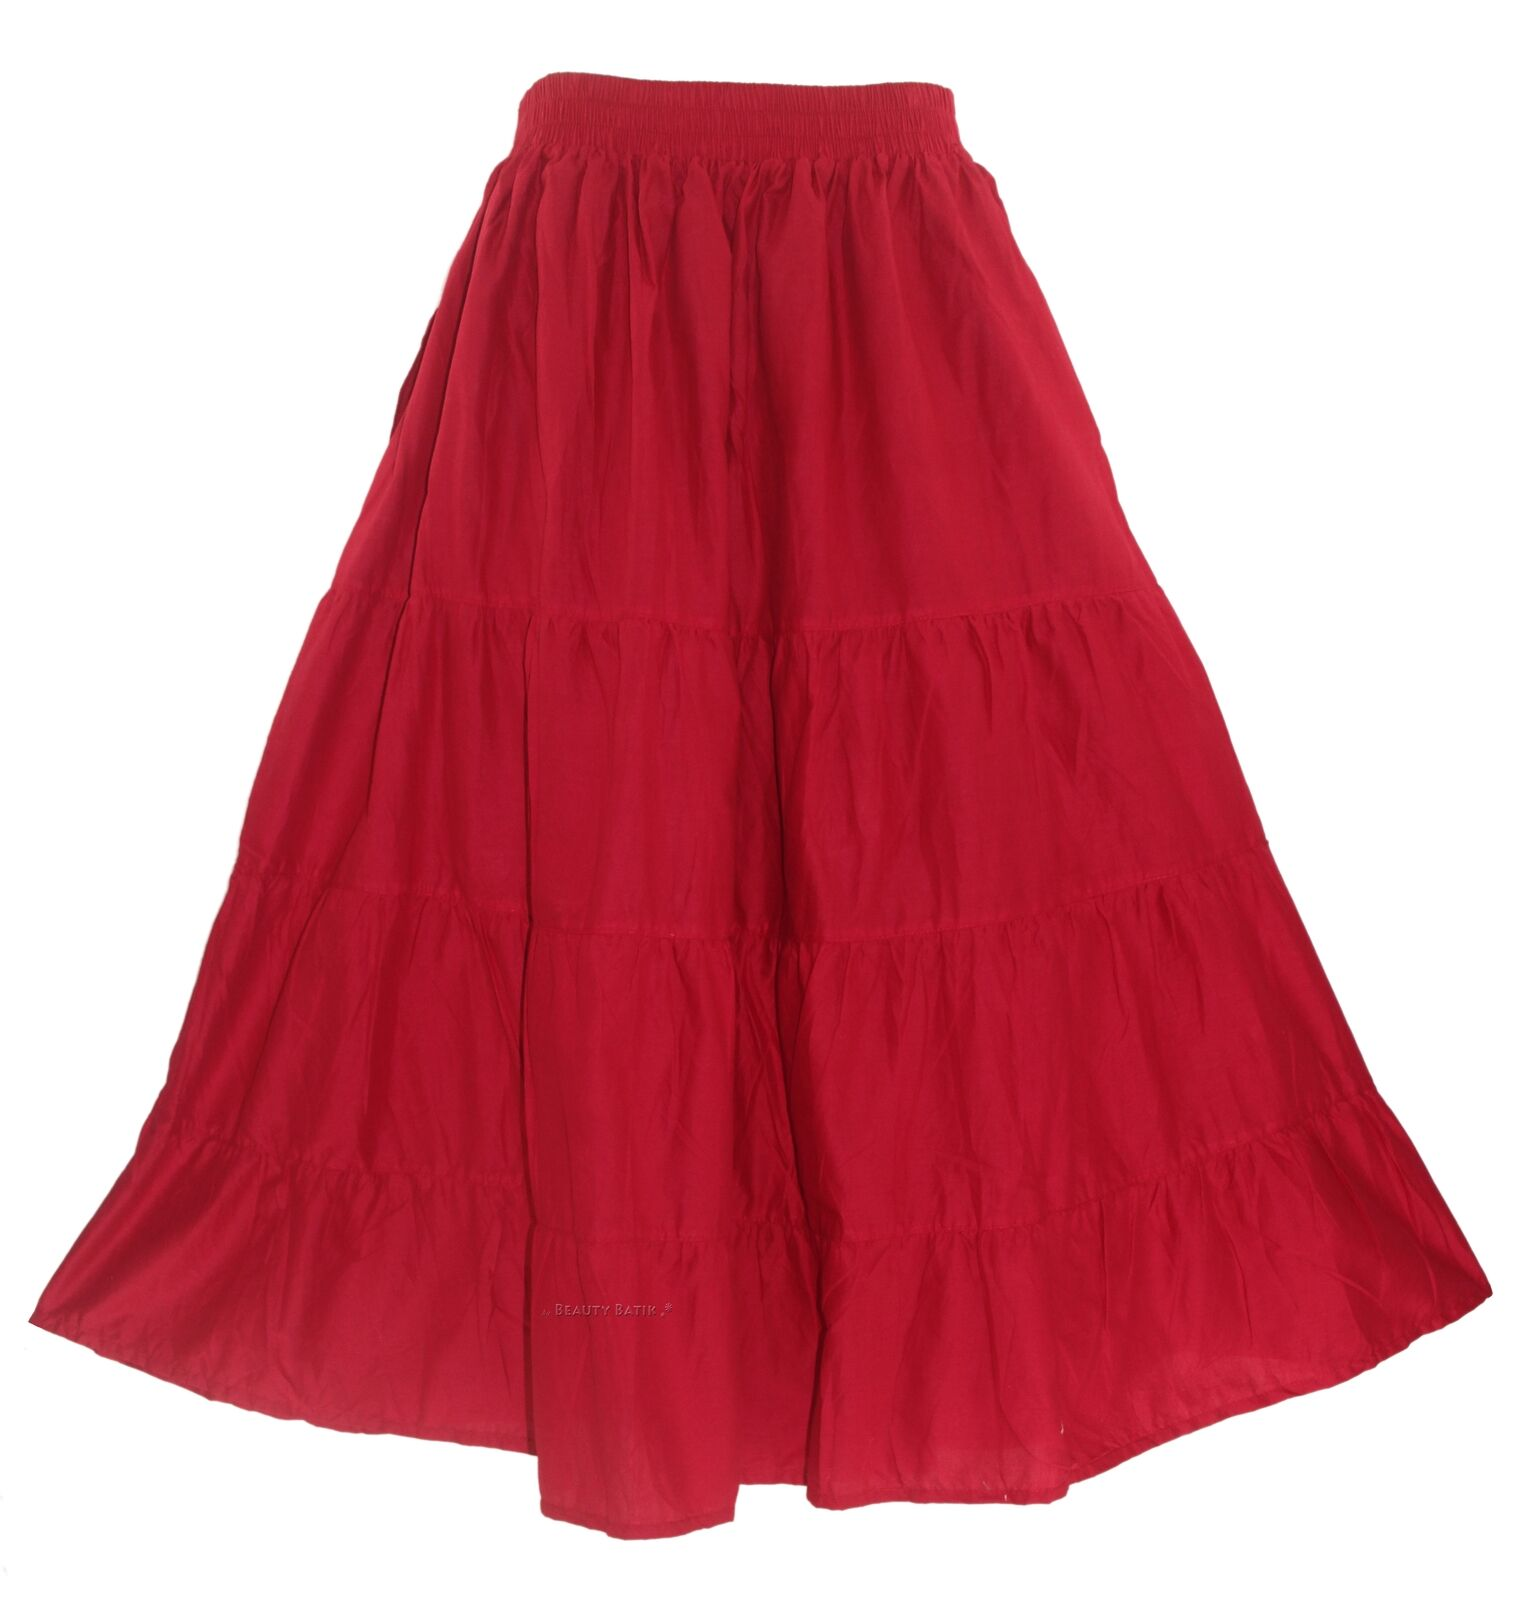 Red Women Cotton BOHO Gypsy Long Maxi Tier Flare Skirt XL 18